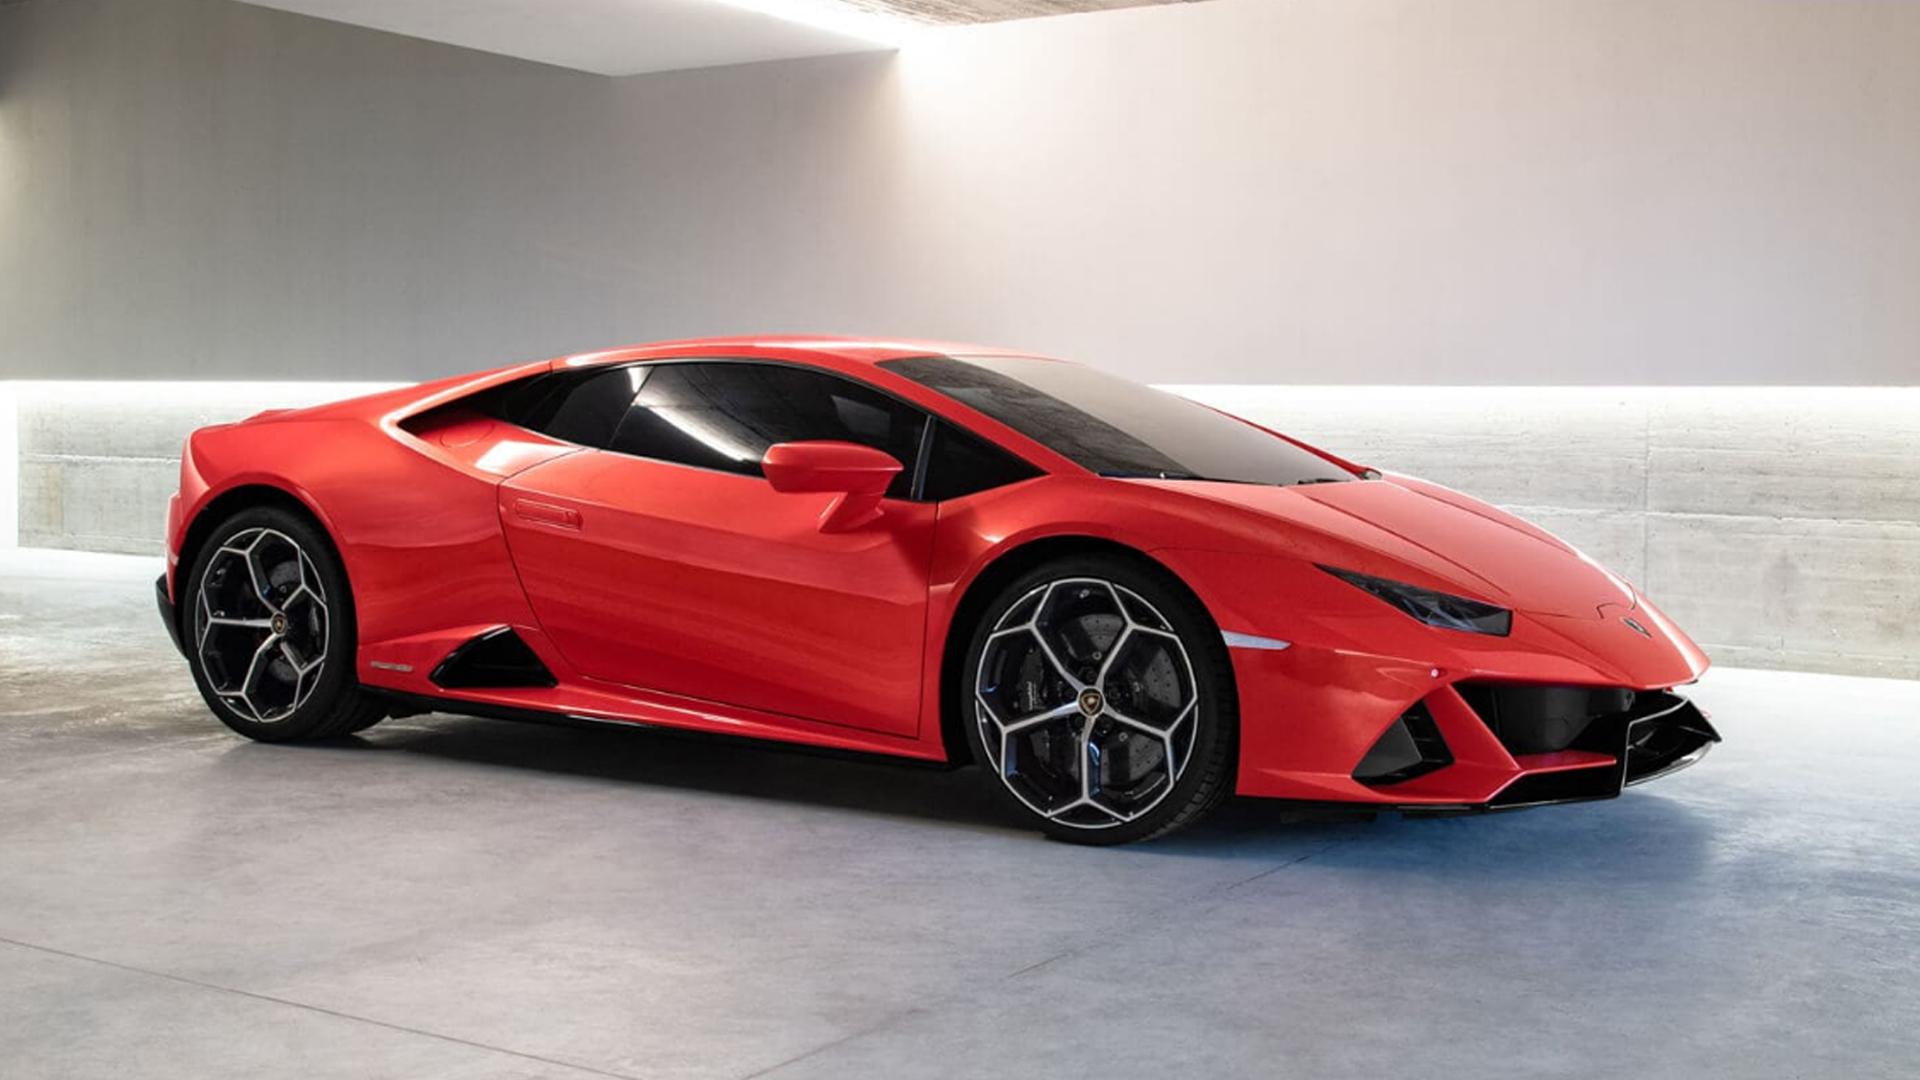 Lamborghini Huracan 2019 EVO Exterior